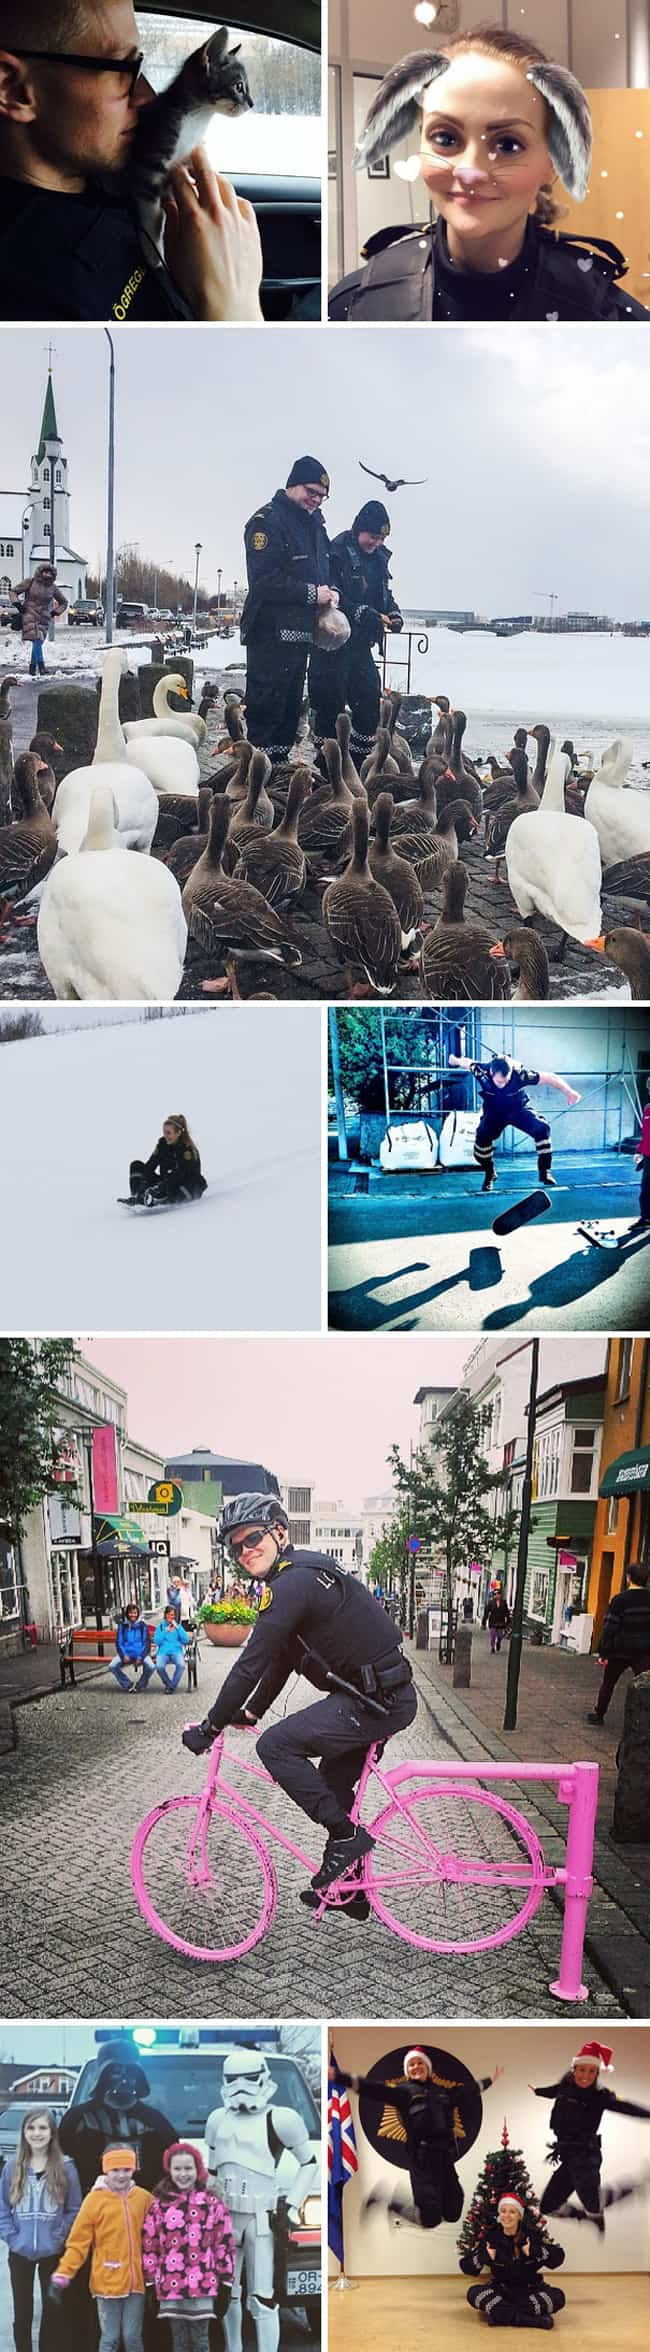 reykjavik-police-department-instagram-police-humor